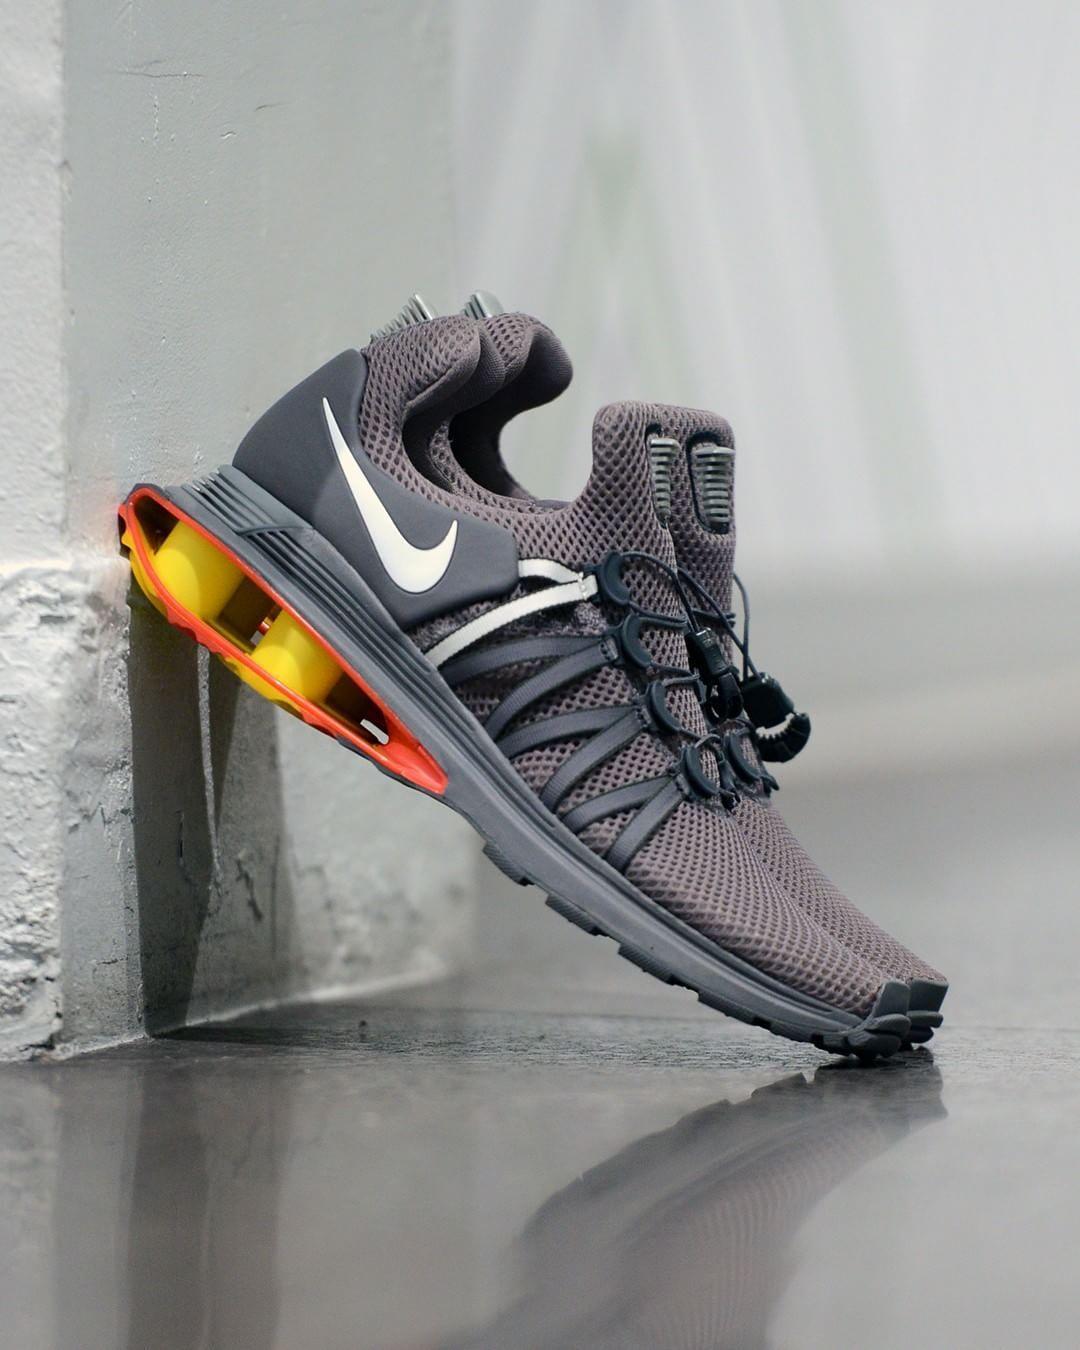 techwear - Nike Shox Gravity 1ebc72c72